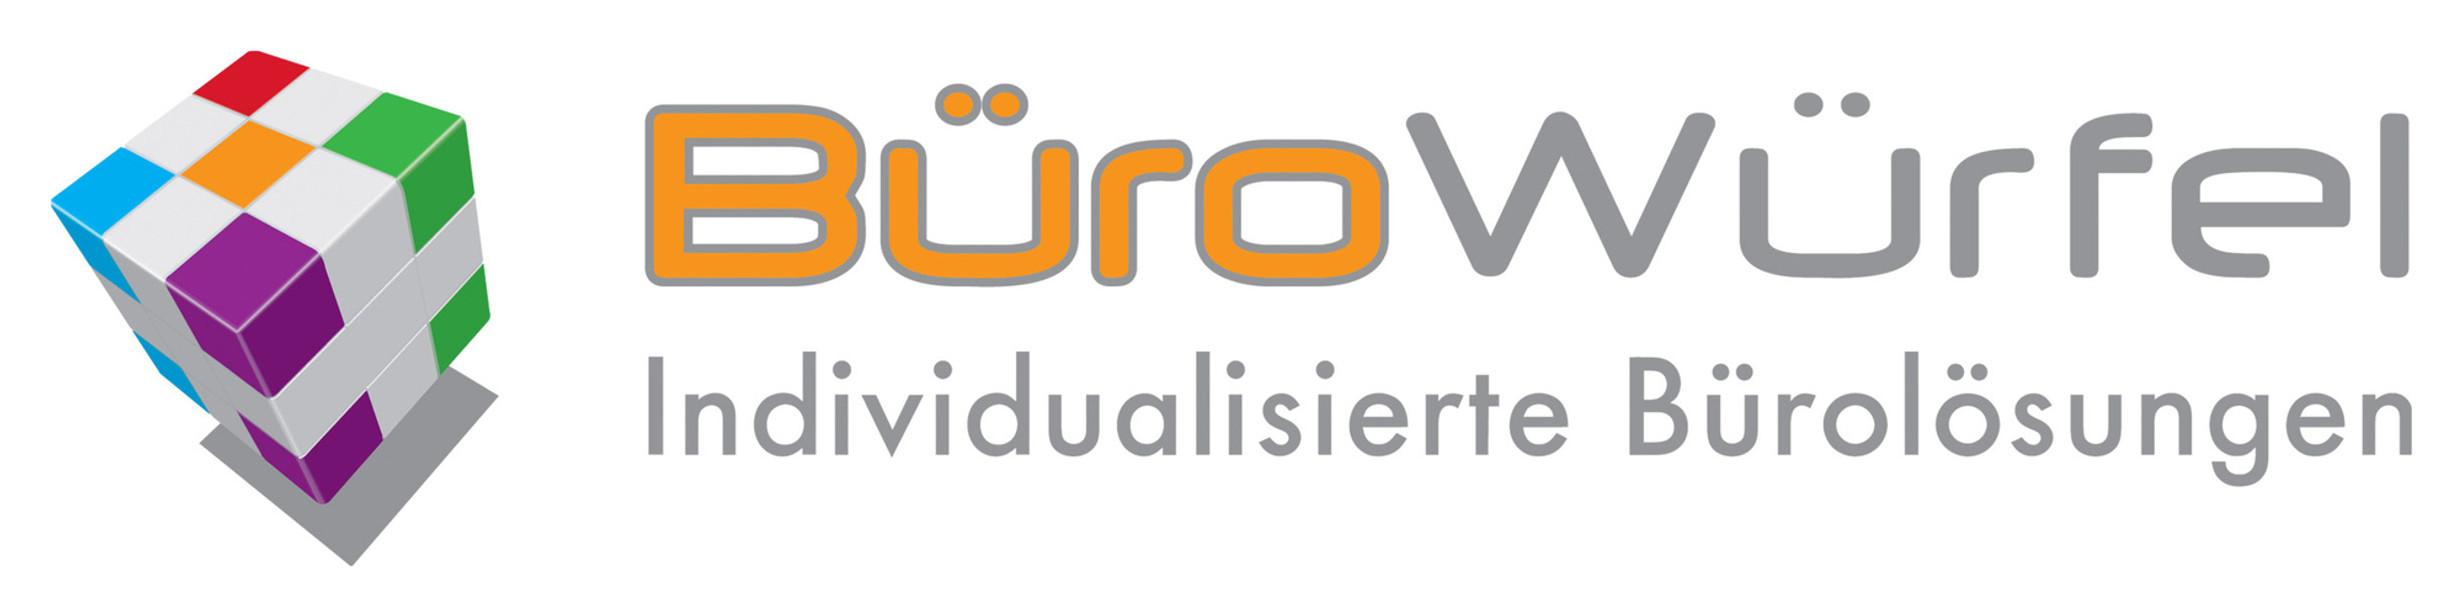 bürowürfel_logo_fertig_def.jpg